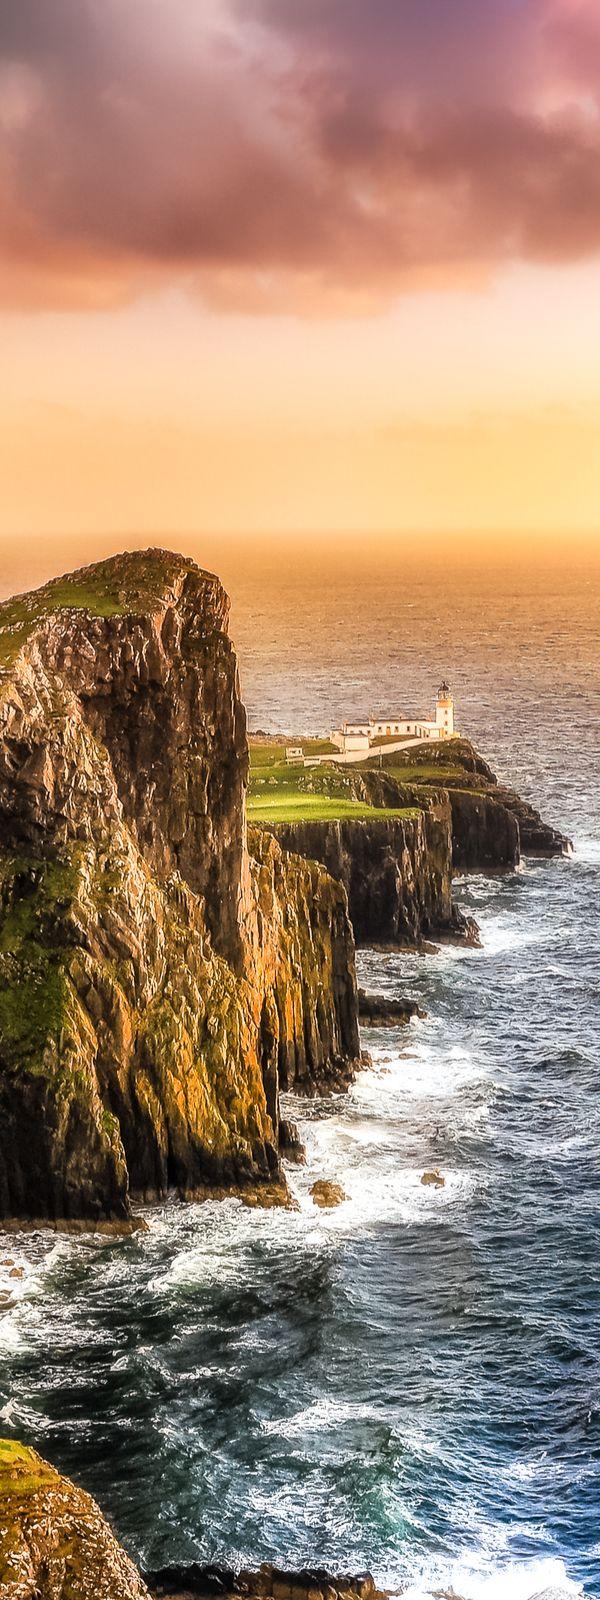 Stunning Landscape & #Lighthouse - #Scotland http://dennisharper.lnf.com/